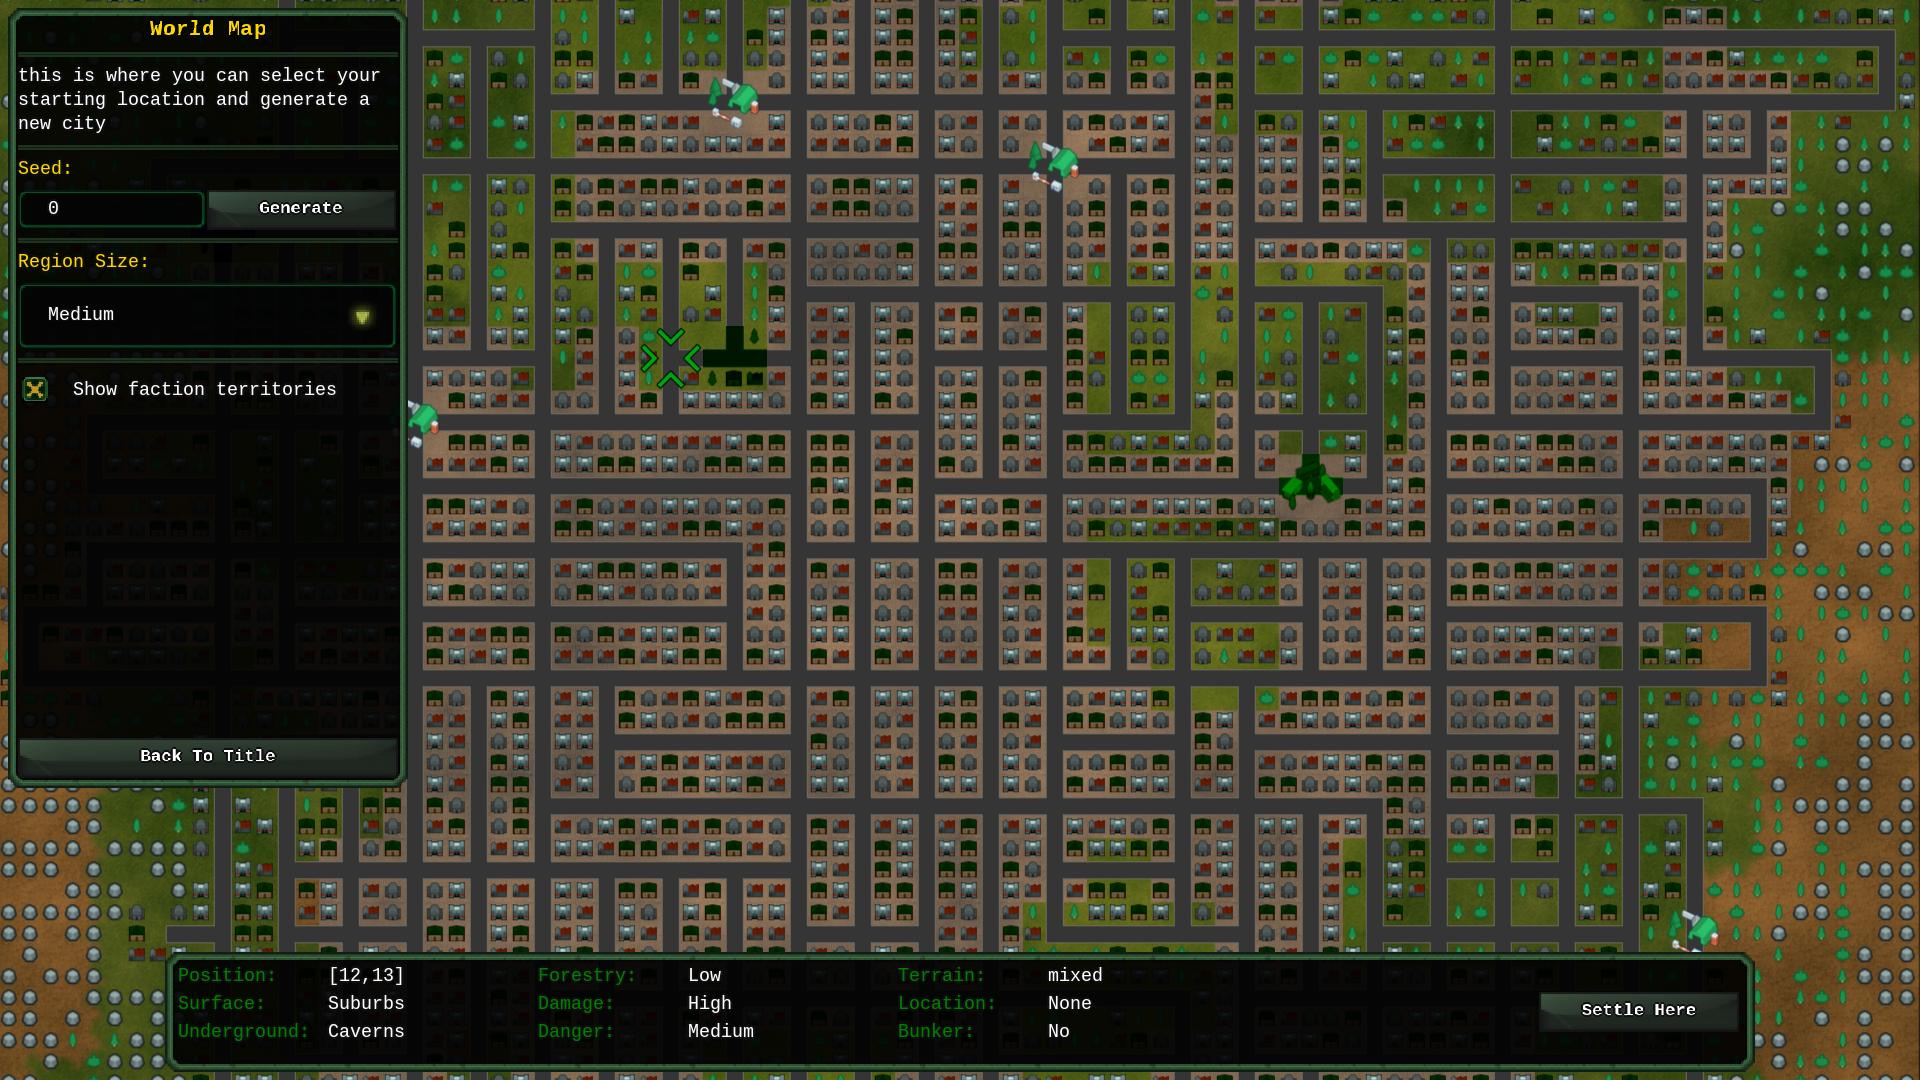 ATC: City Map